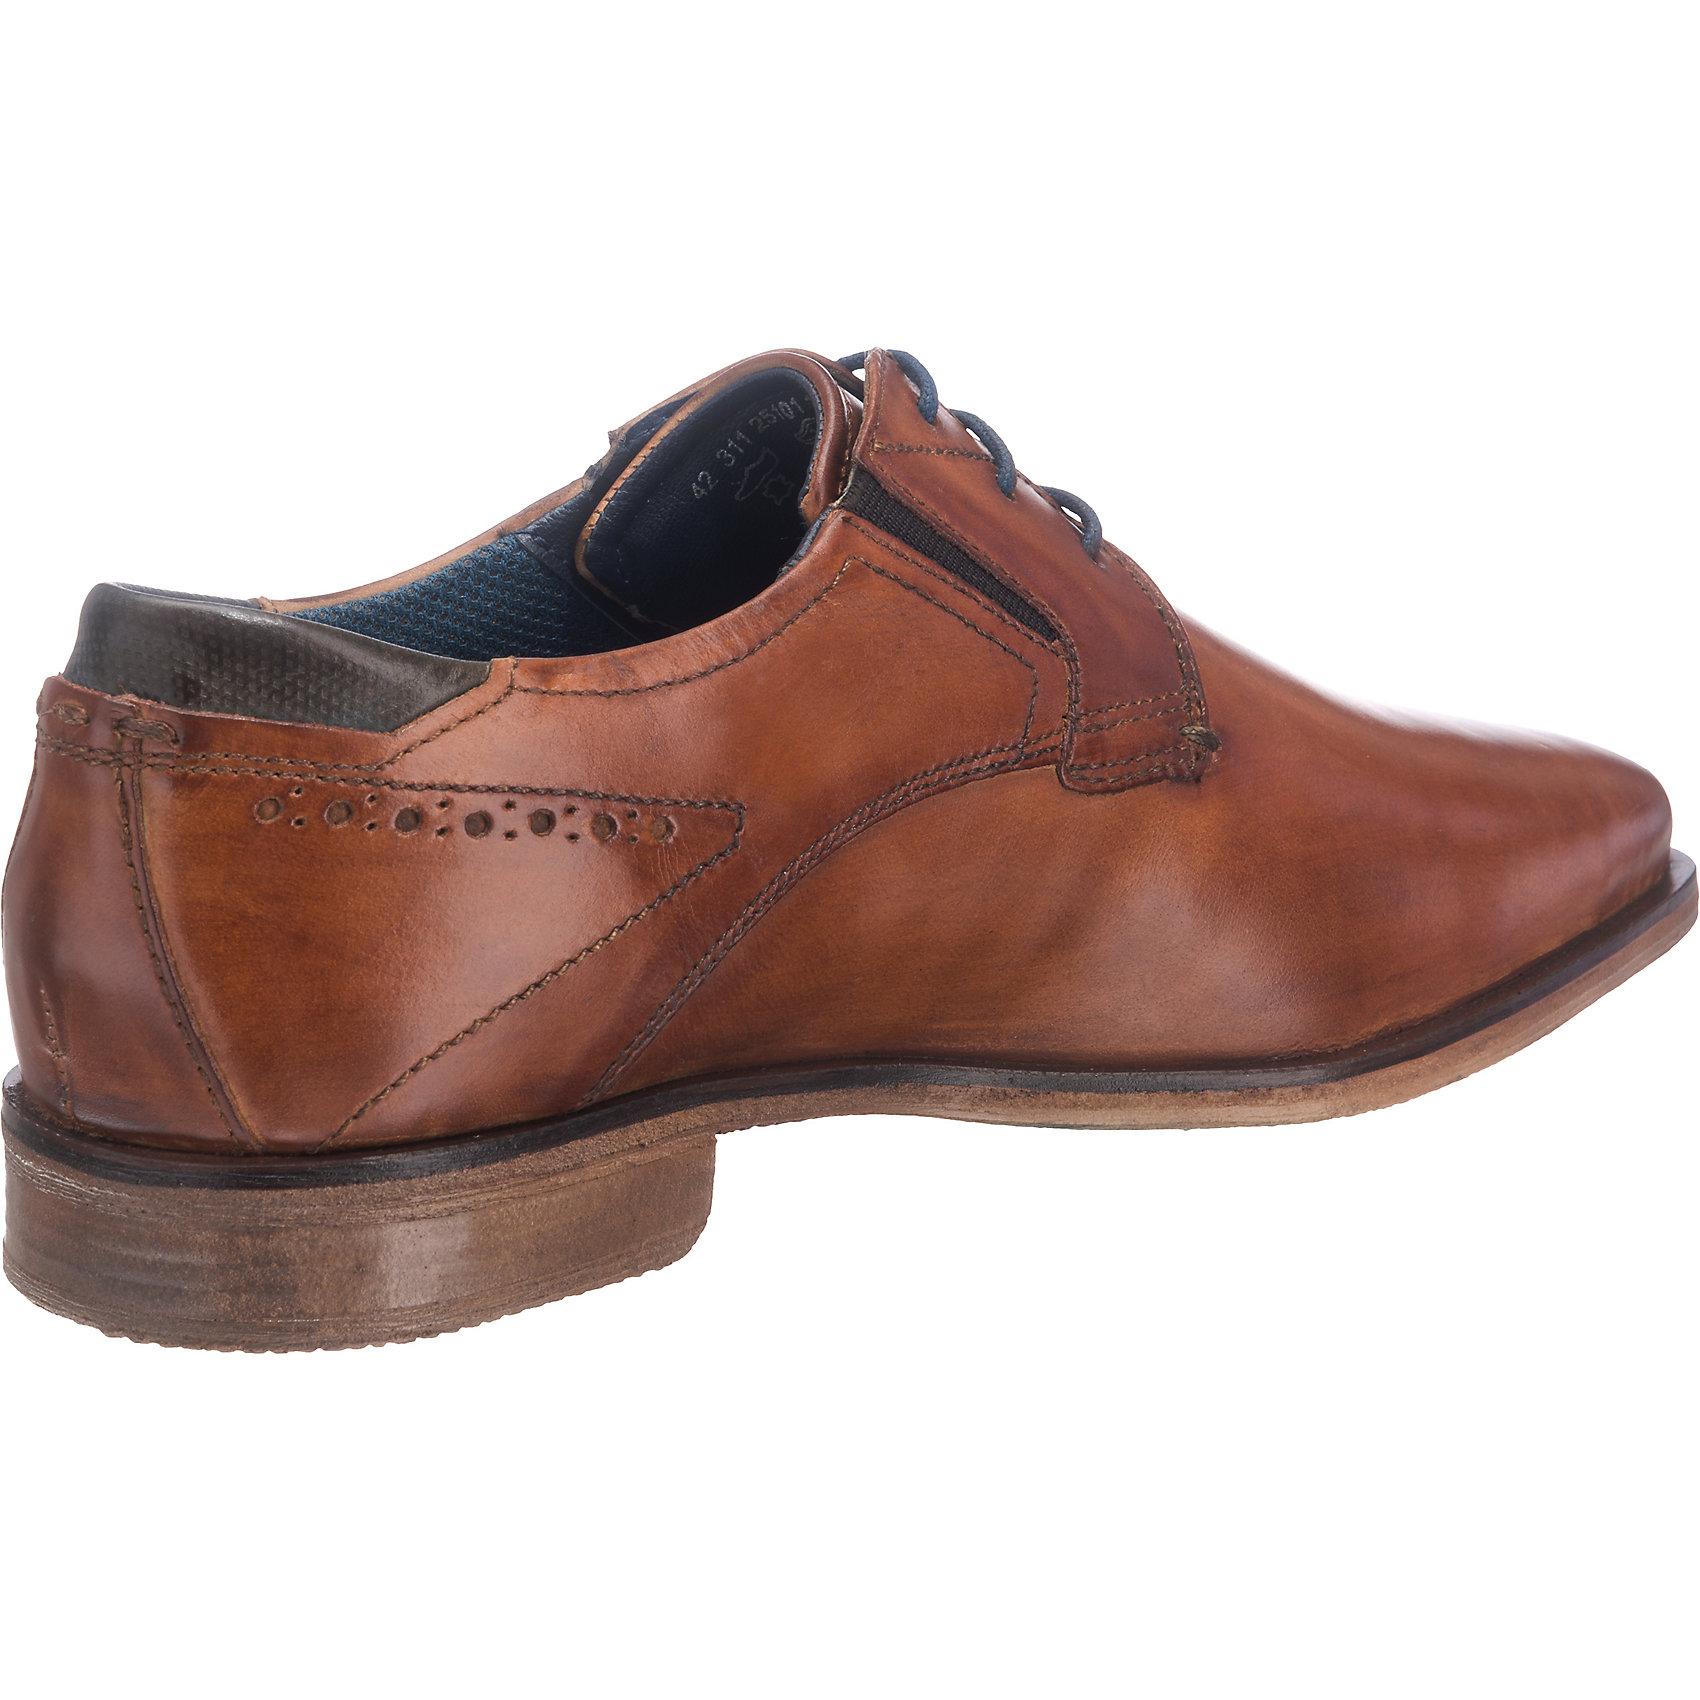 Neu bugatti Business Schuhe 5771207 für Herren cognac